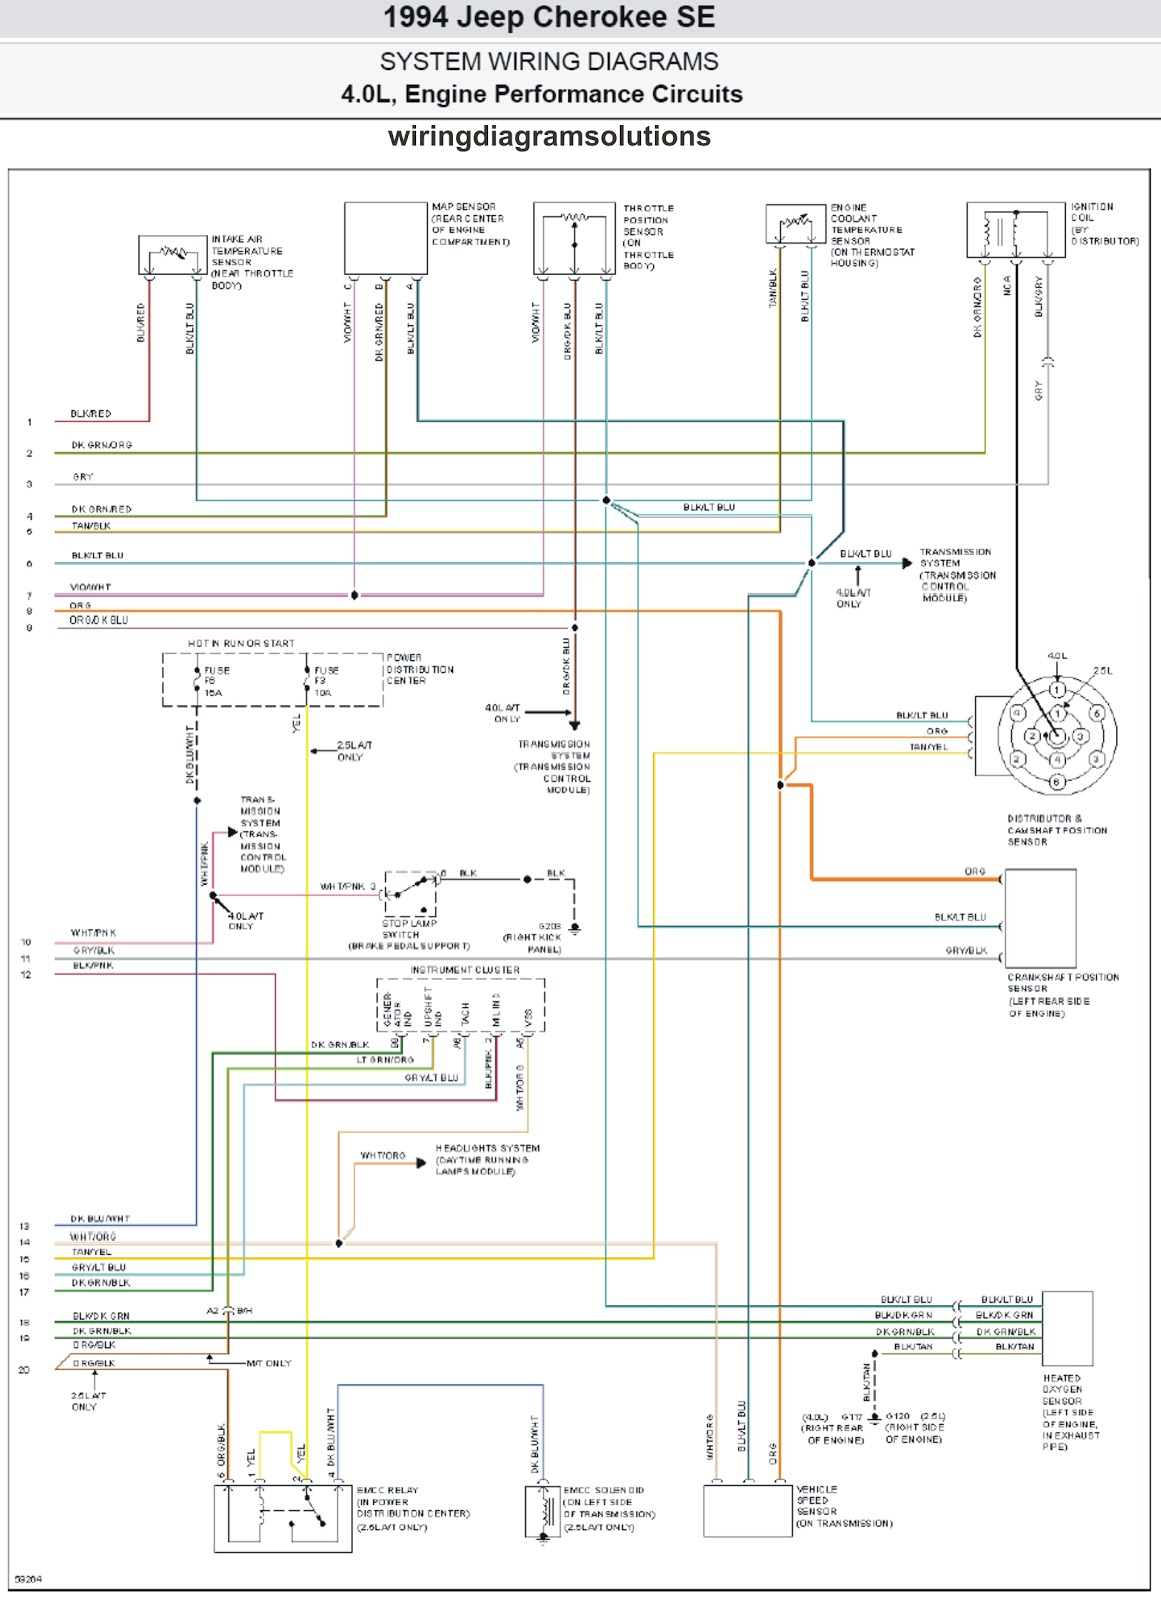 1999 Kia Sephia Wiring Diagram Schematic Wiring Diagrams \u2022 2011 Kia  Optima Fuse Box Diagram 2001 Kia Sephia Fuse Box Diagram Wiring Schematic